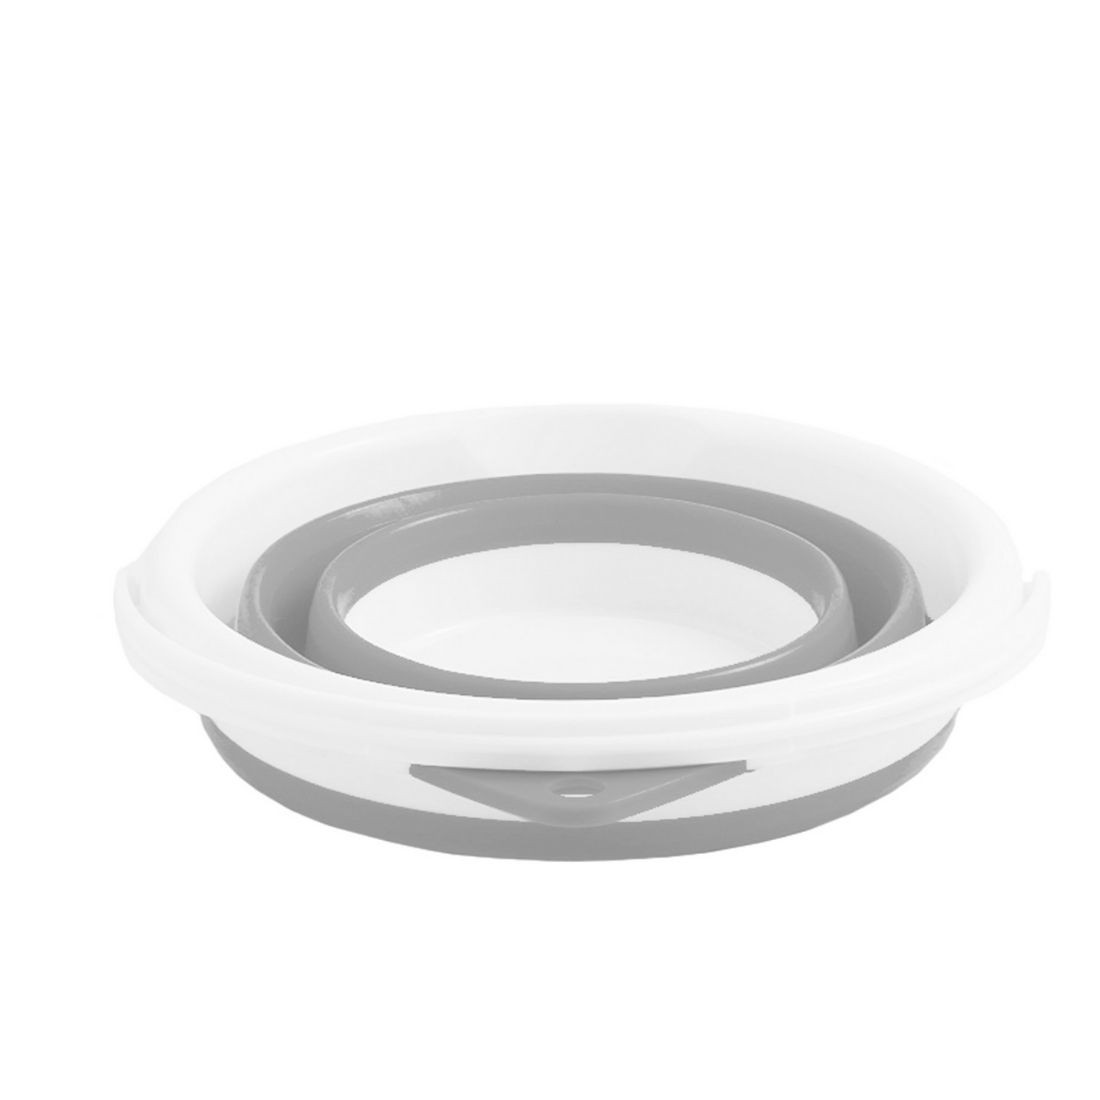 Balde Dobrável Retrátil Sanfonado Multiuso Silicone 10L - Cinza